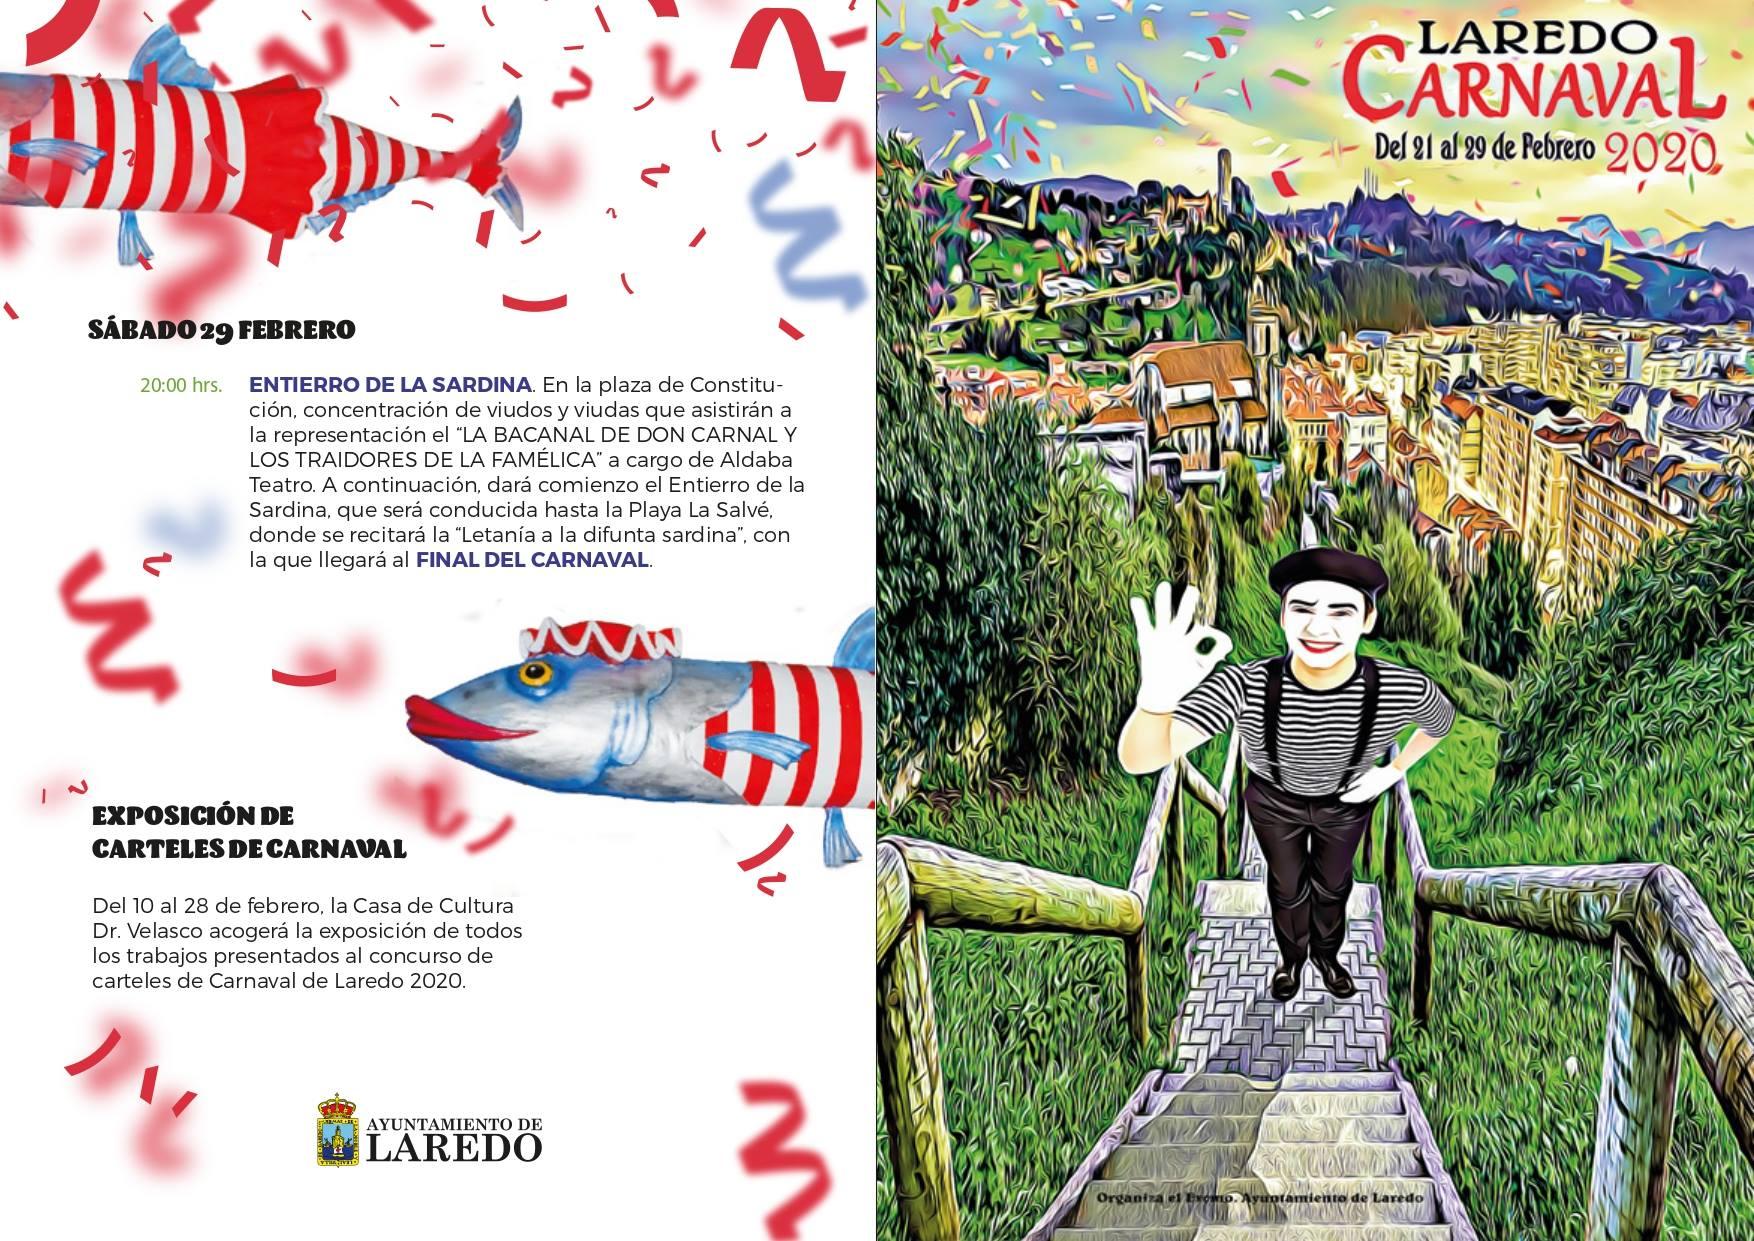 Carnaval 2020 - Laredo (Cantabria) 1